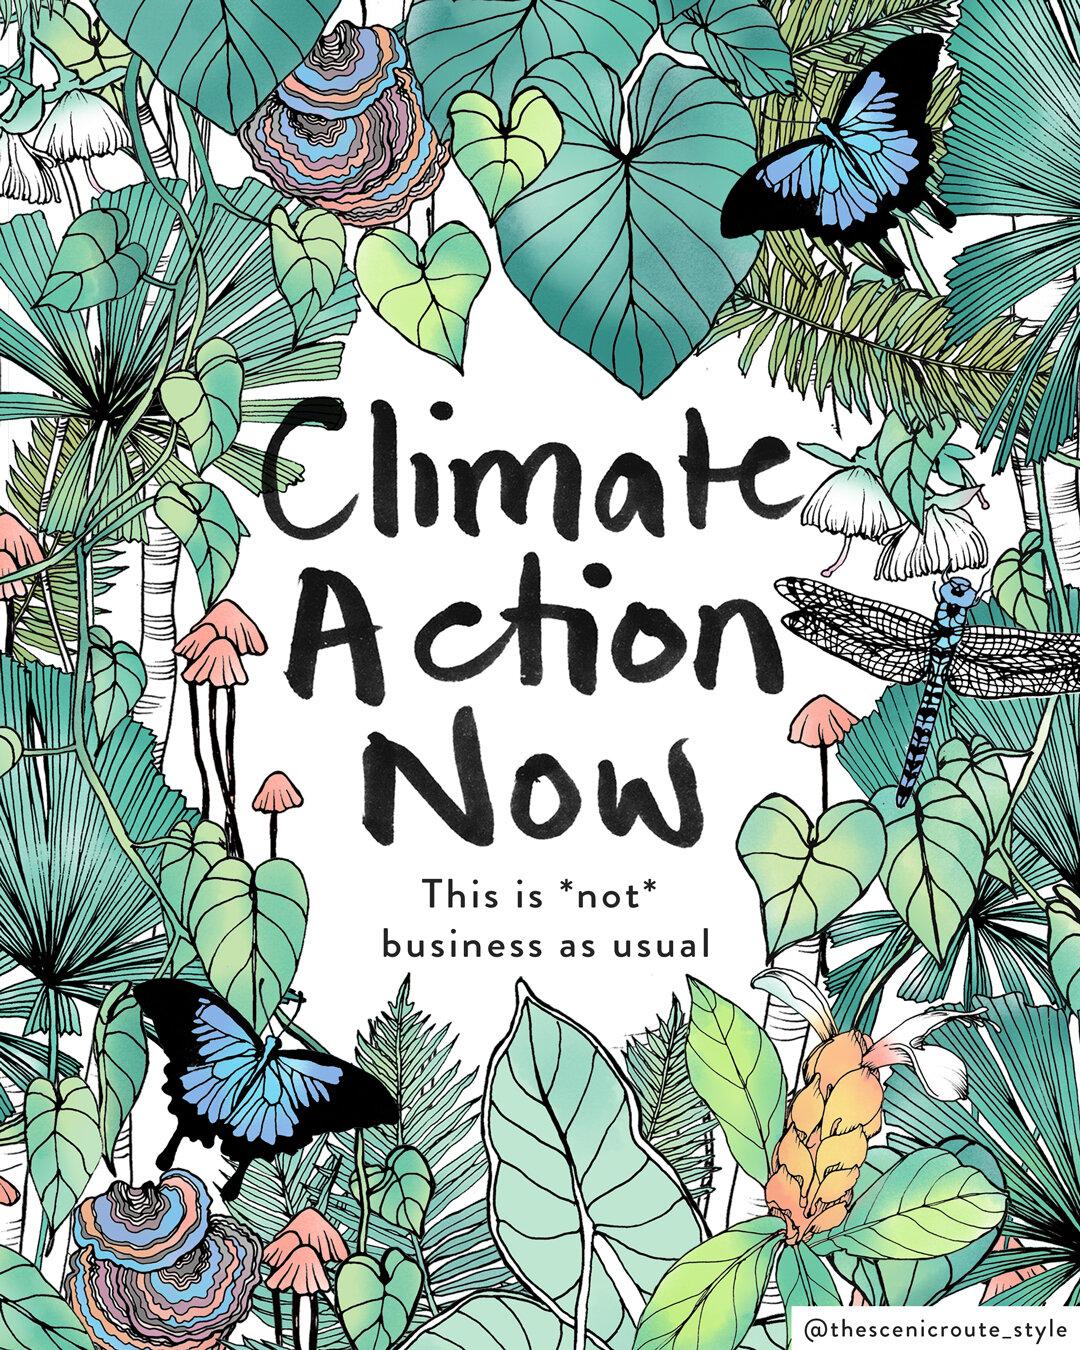 Ciimate Action Now illustration Rainforest